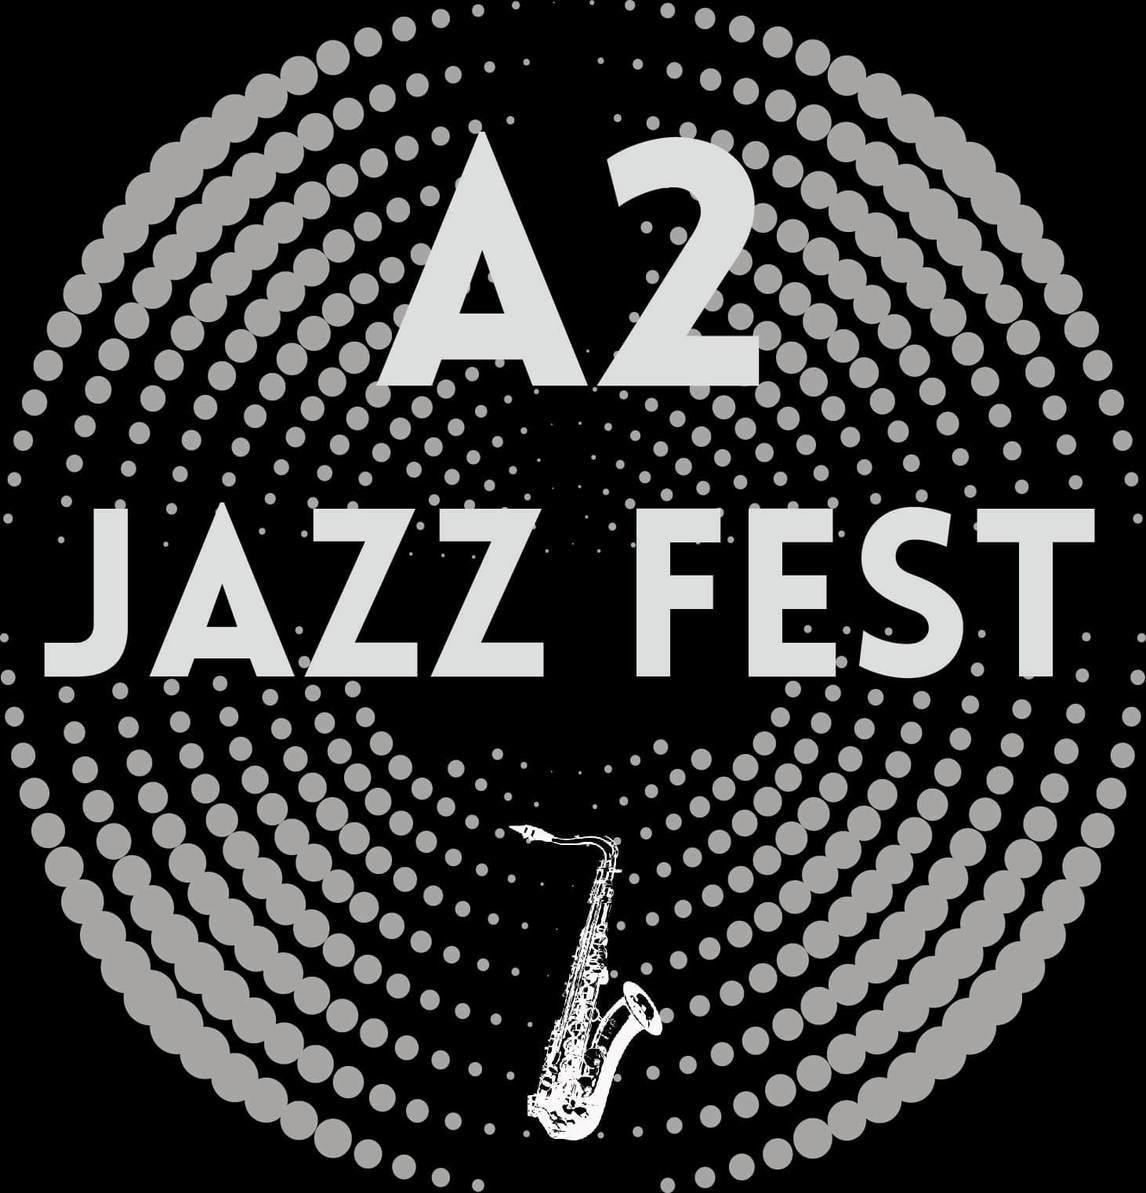 A2 Jazz Fest